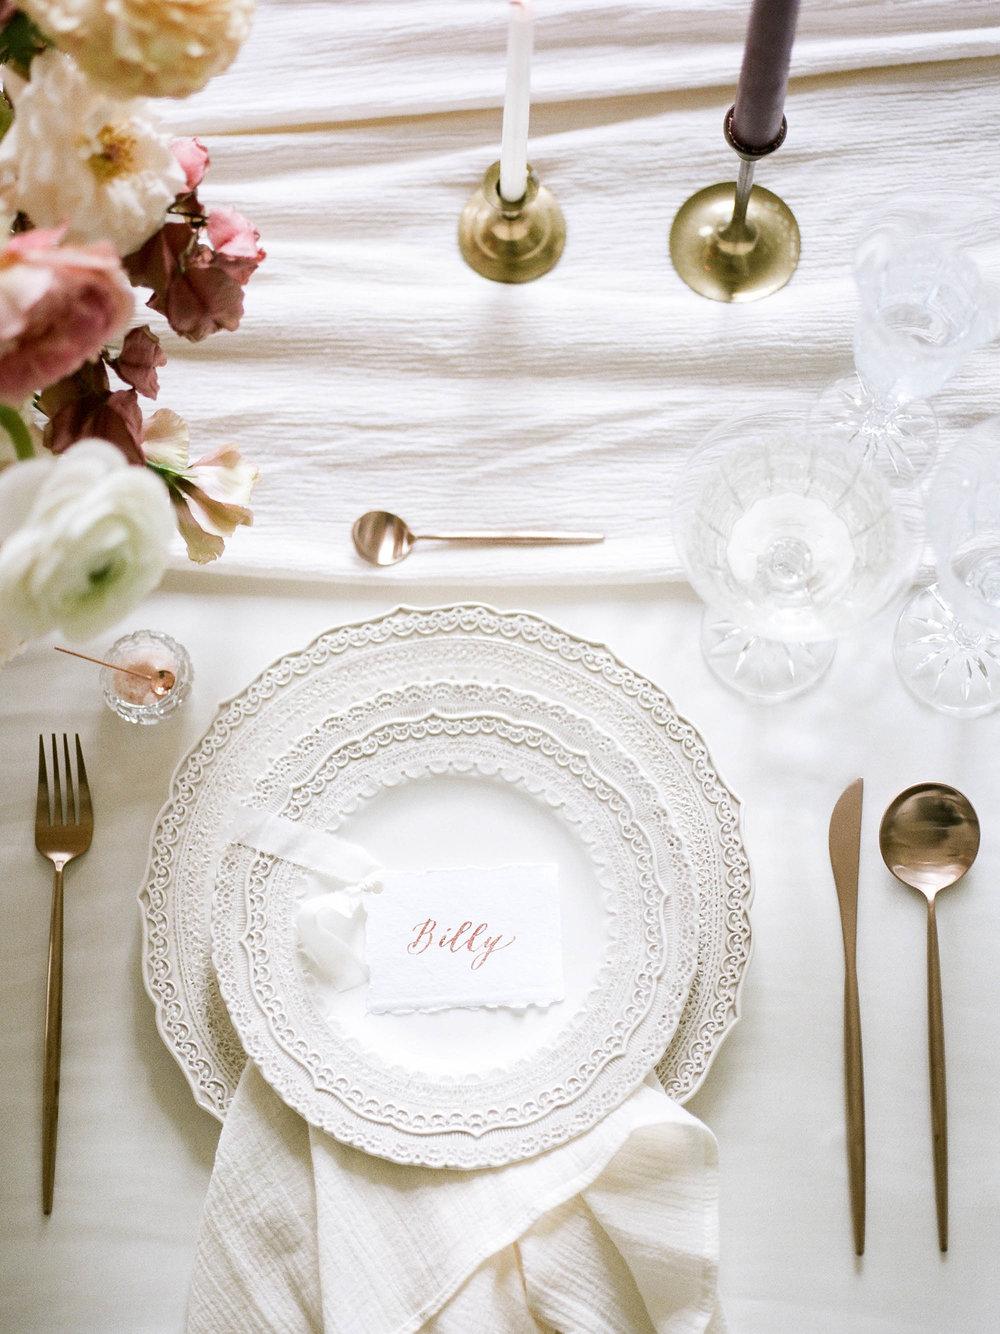 Wedding Place Setting_OdeToJoyFlowers-25_Christine Gosch_Dreams and Nostalgia.jpg